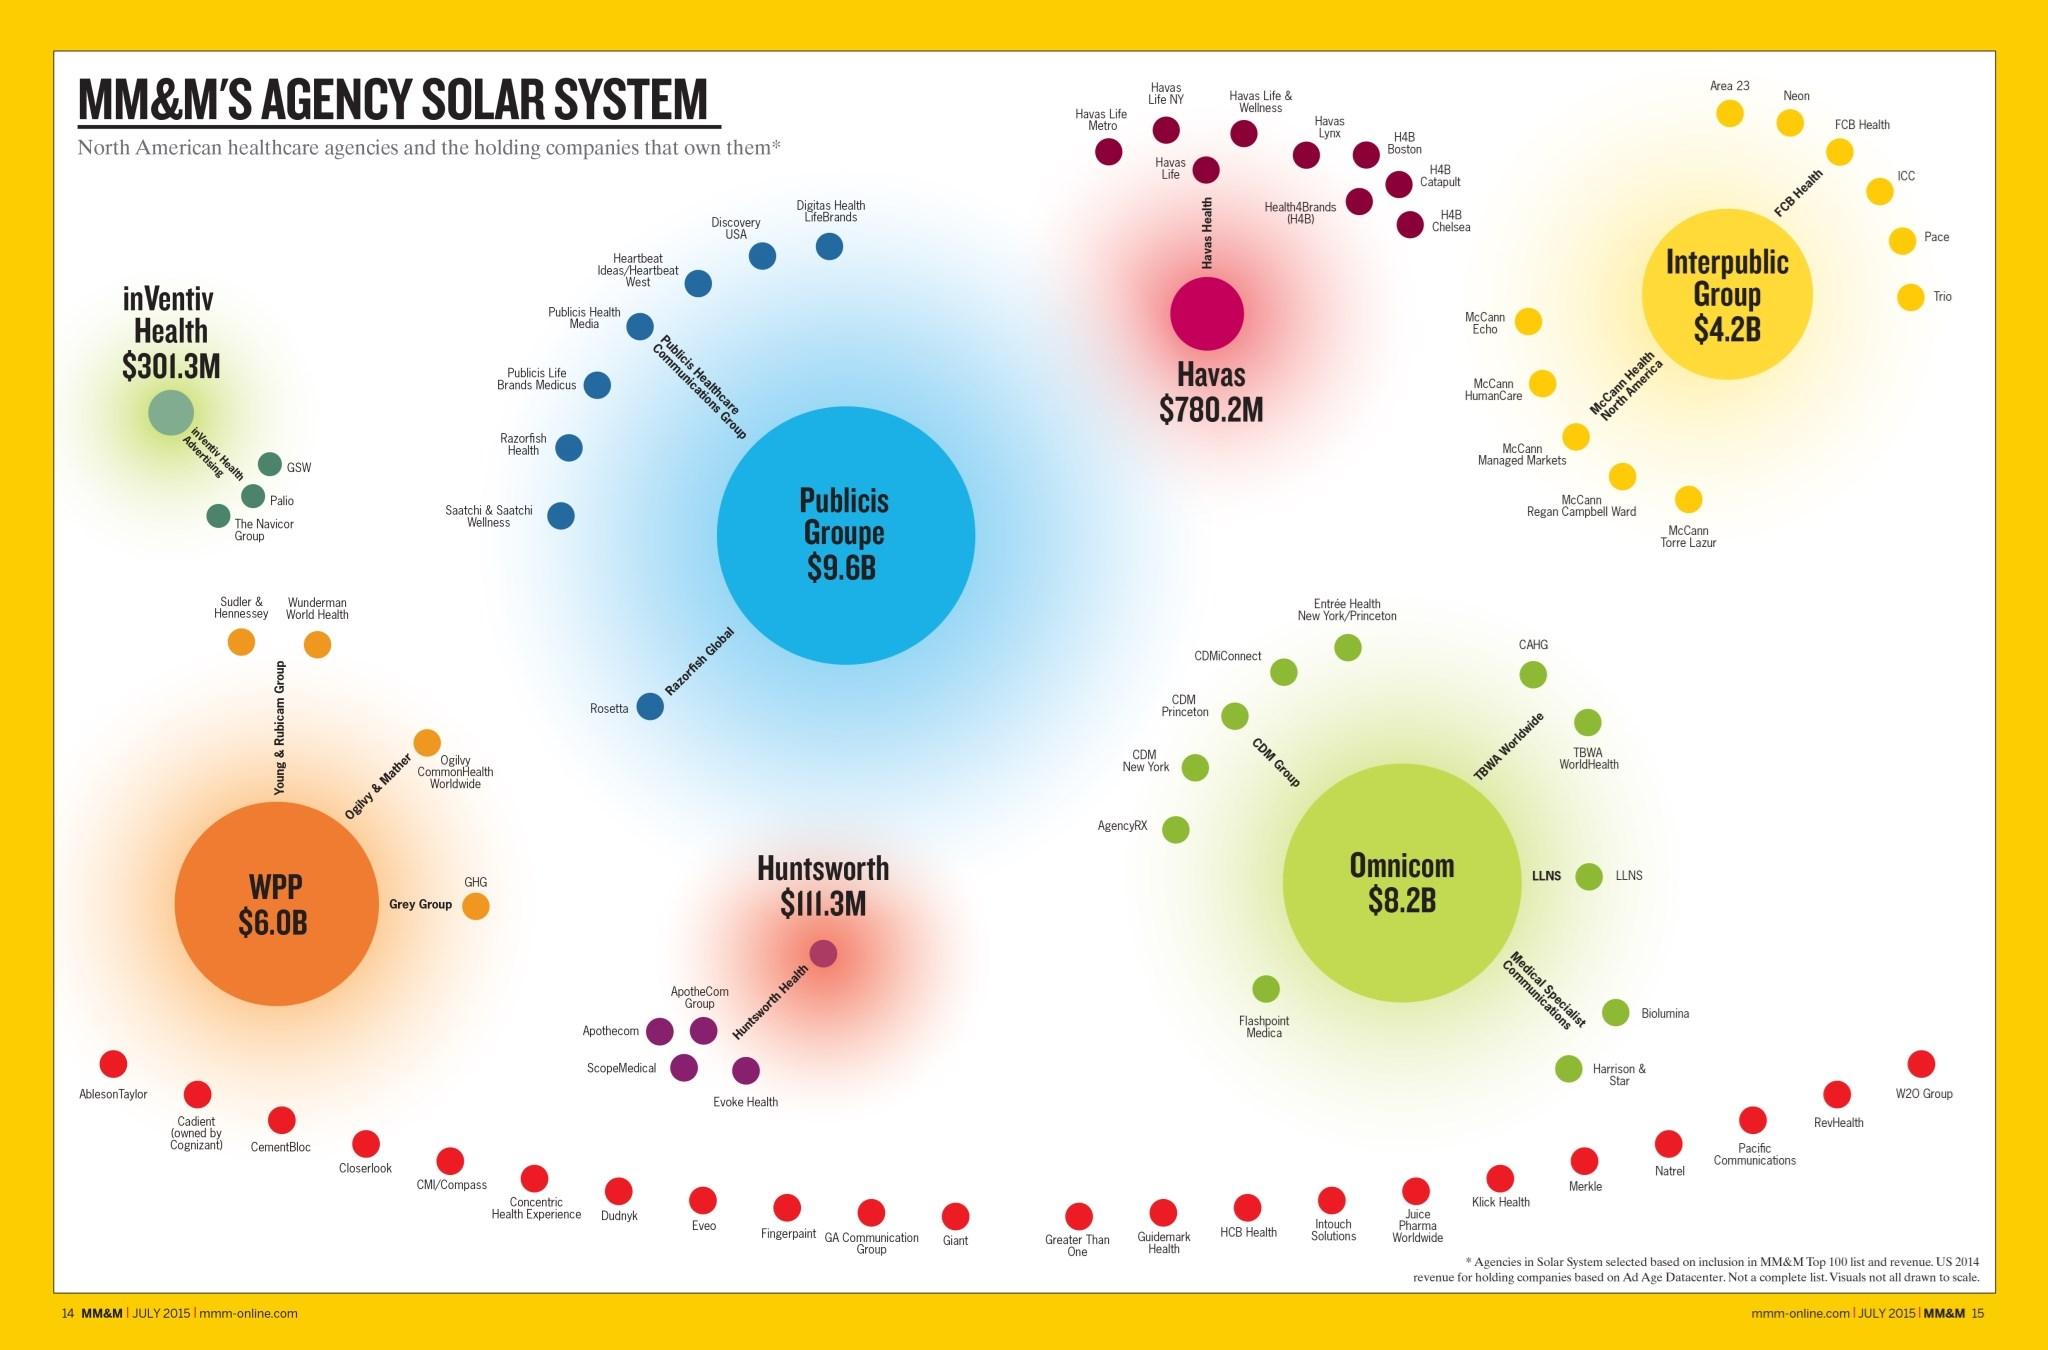 MM&M's Agency Solar System